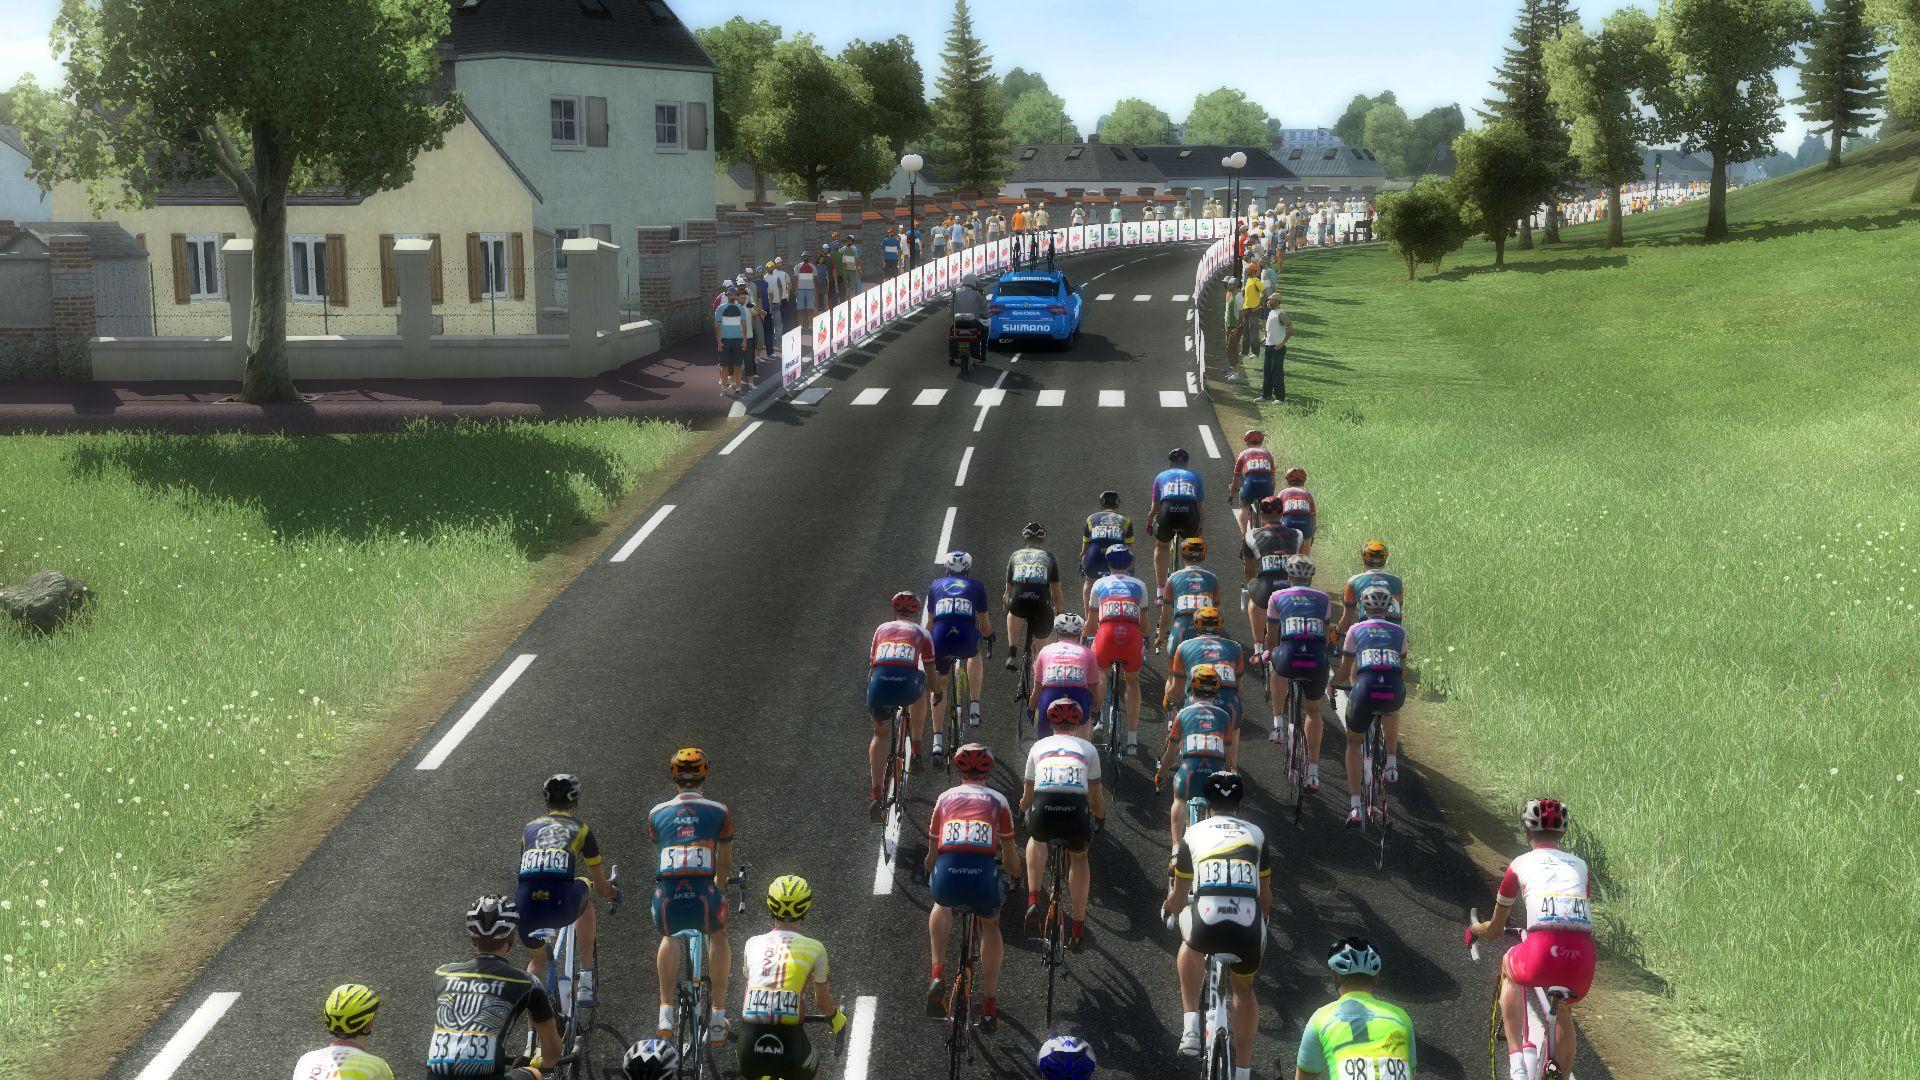 pcmdaily.com/images/mg/2020/Reports/GTM/Giro/S18/mg20_giro_s18_13.jpg